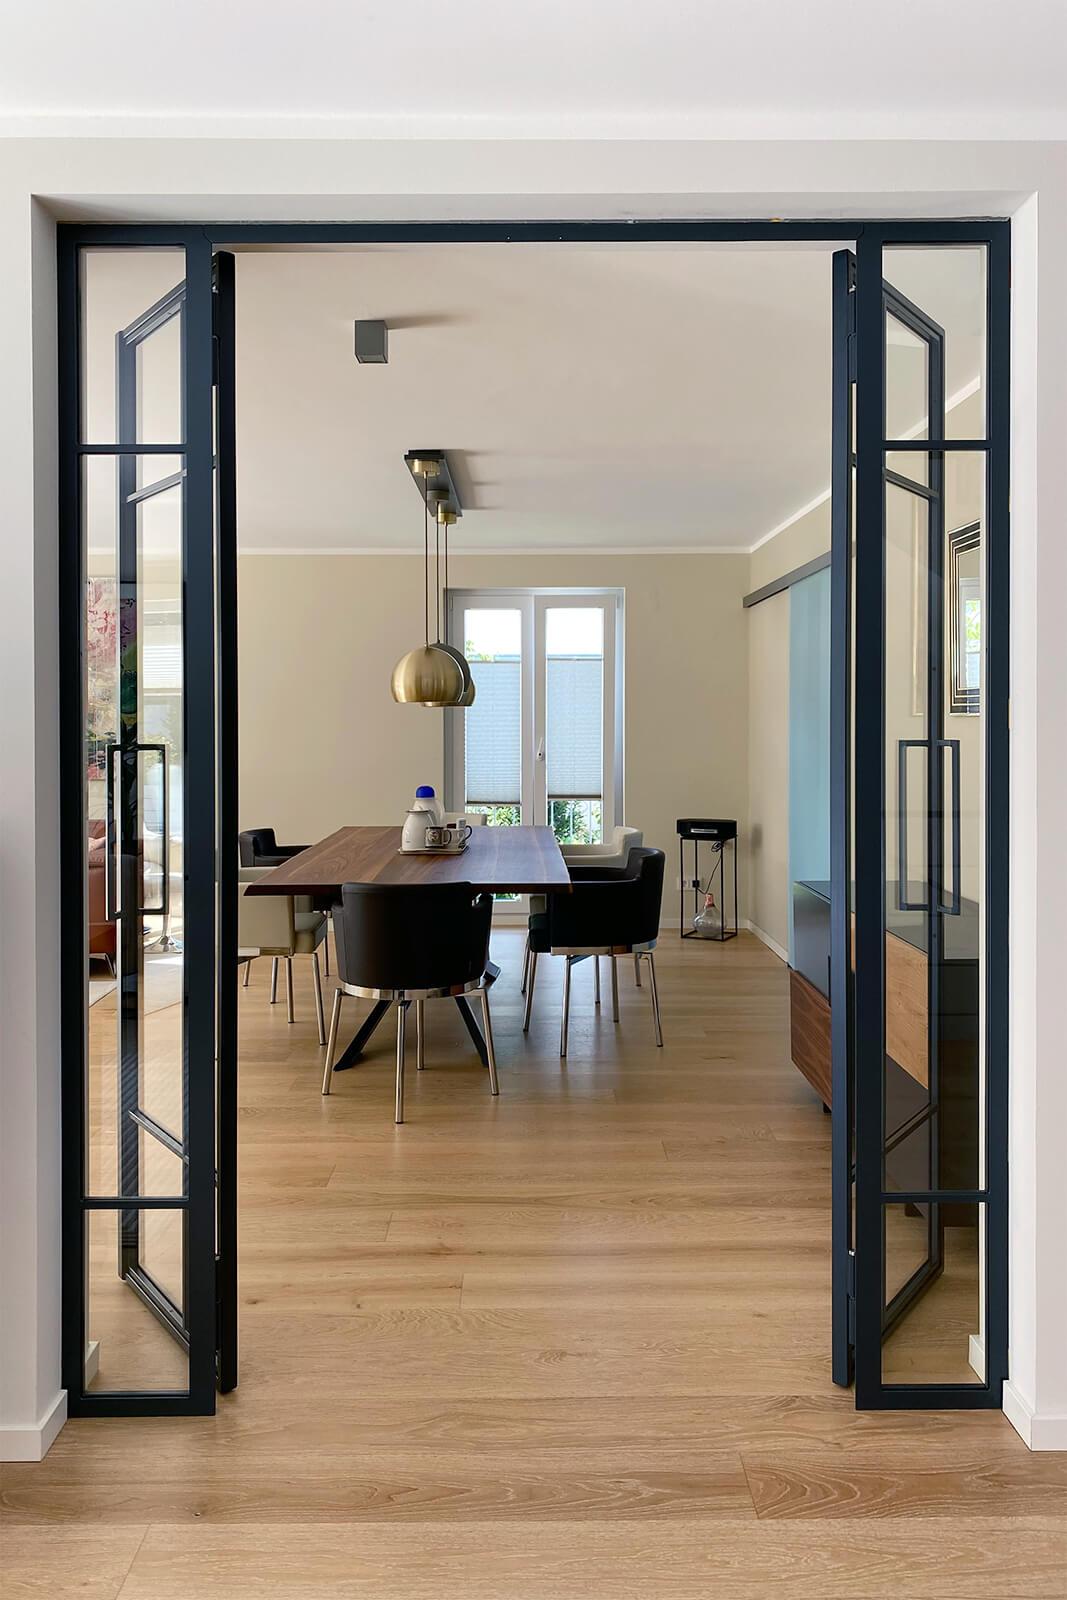 Loftstahl, Loft-Stahl.de - Doppel Drehtür, Designtür, Stahl Loft Tür, Windfang, Glastrennwand, Designtür